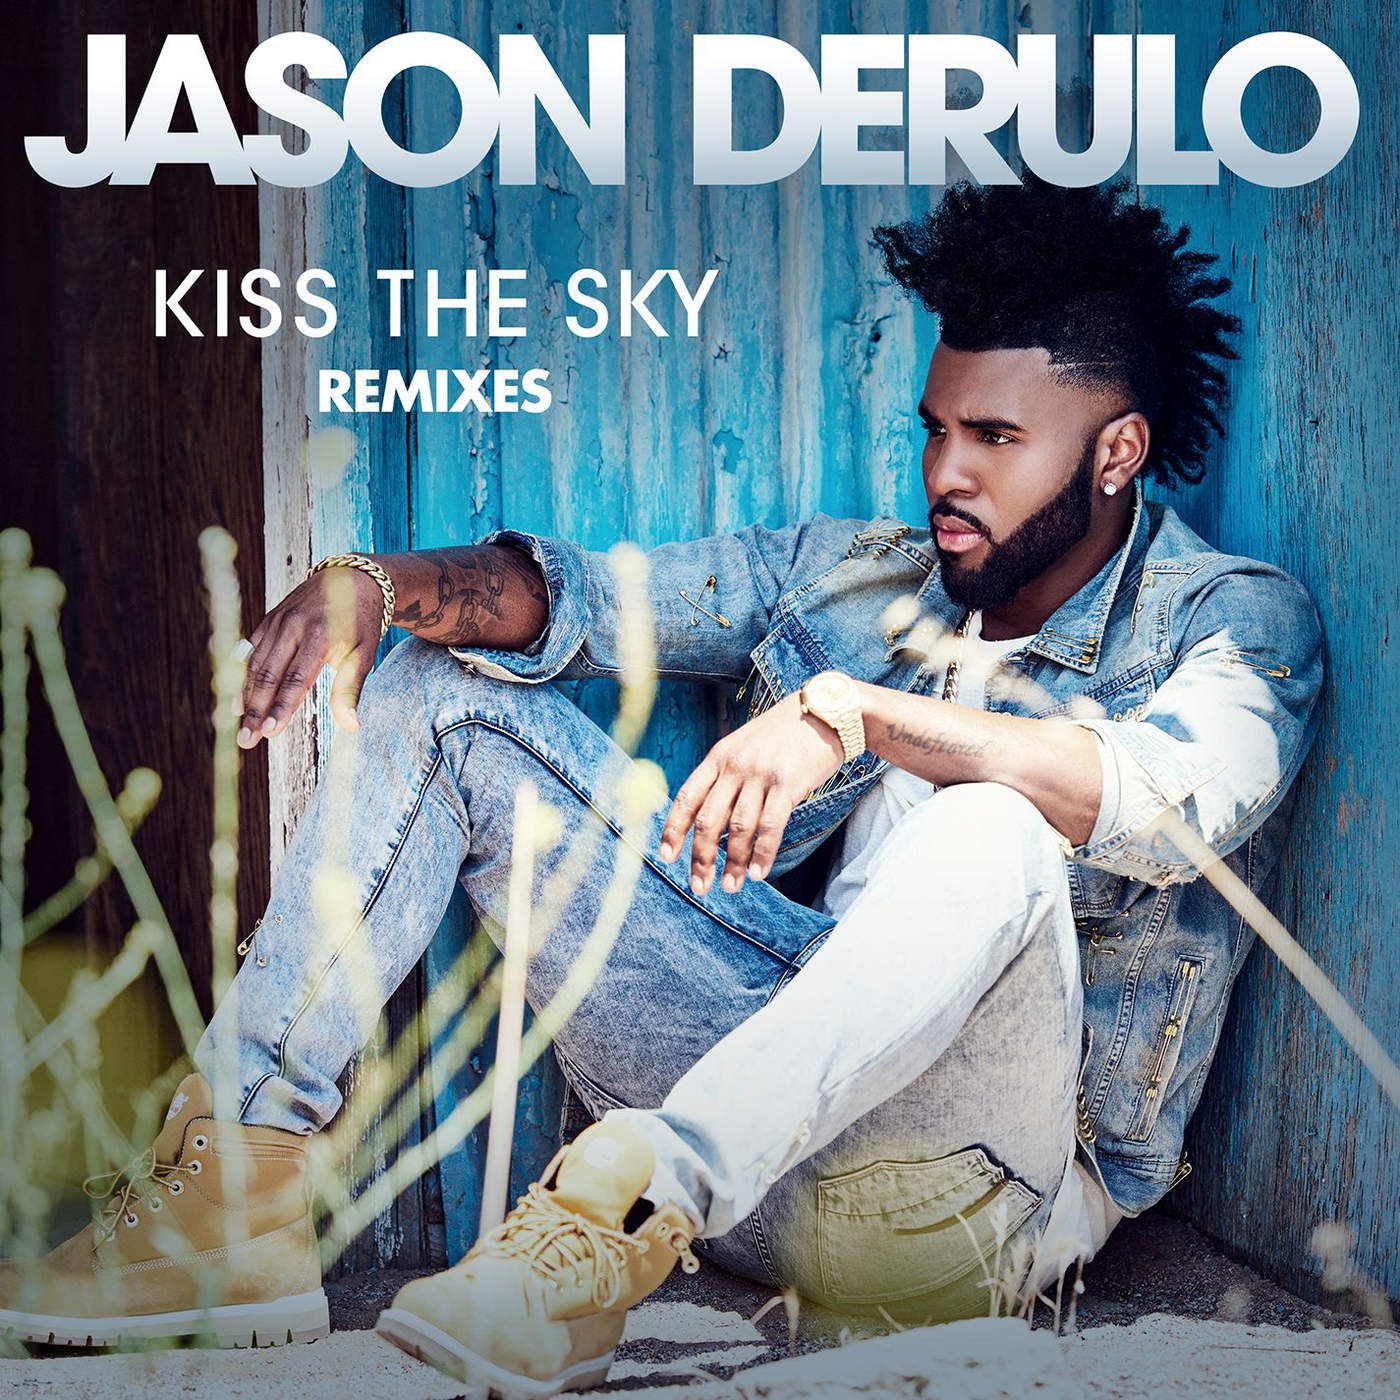 Jason Derulo - Kiss the Sky (Remixes) - Single Cover